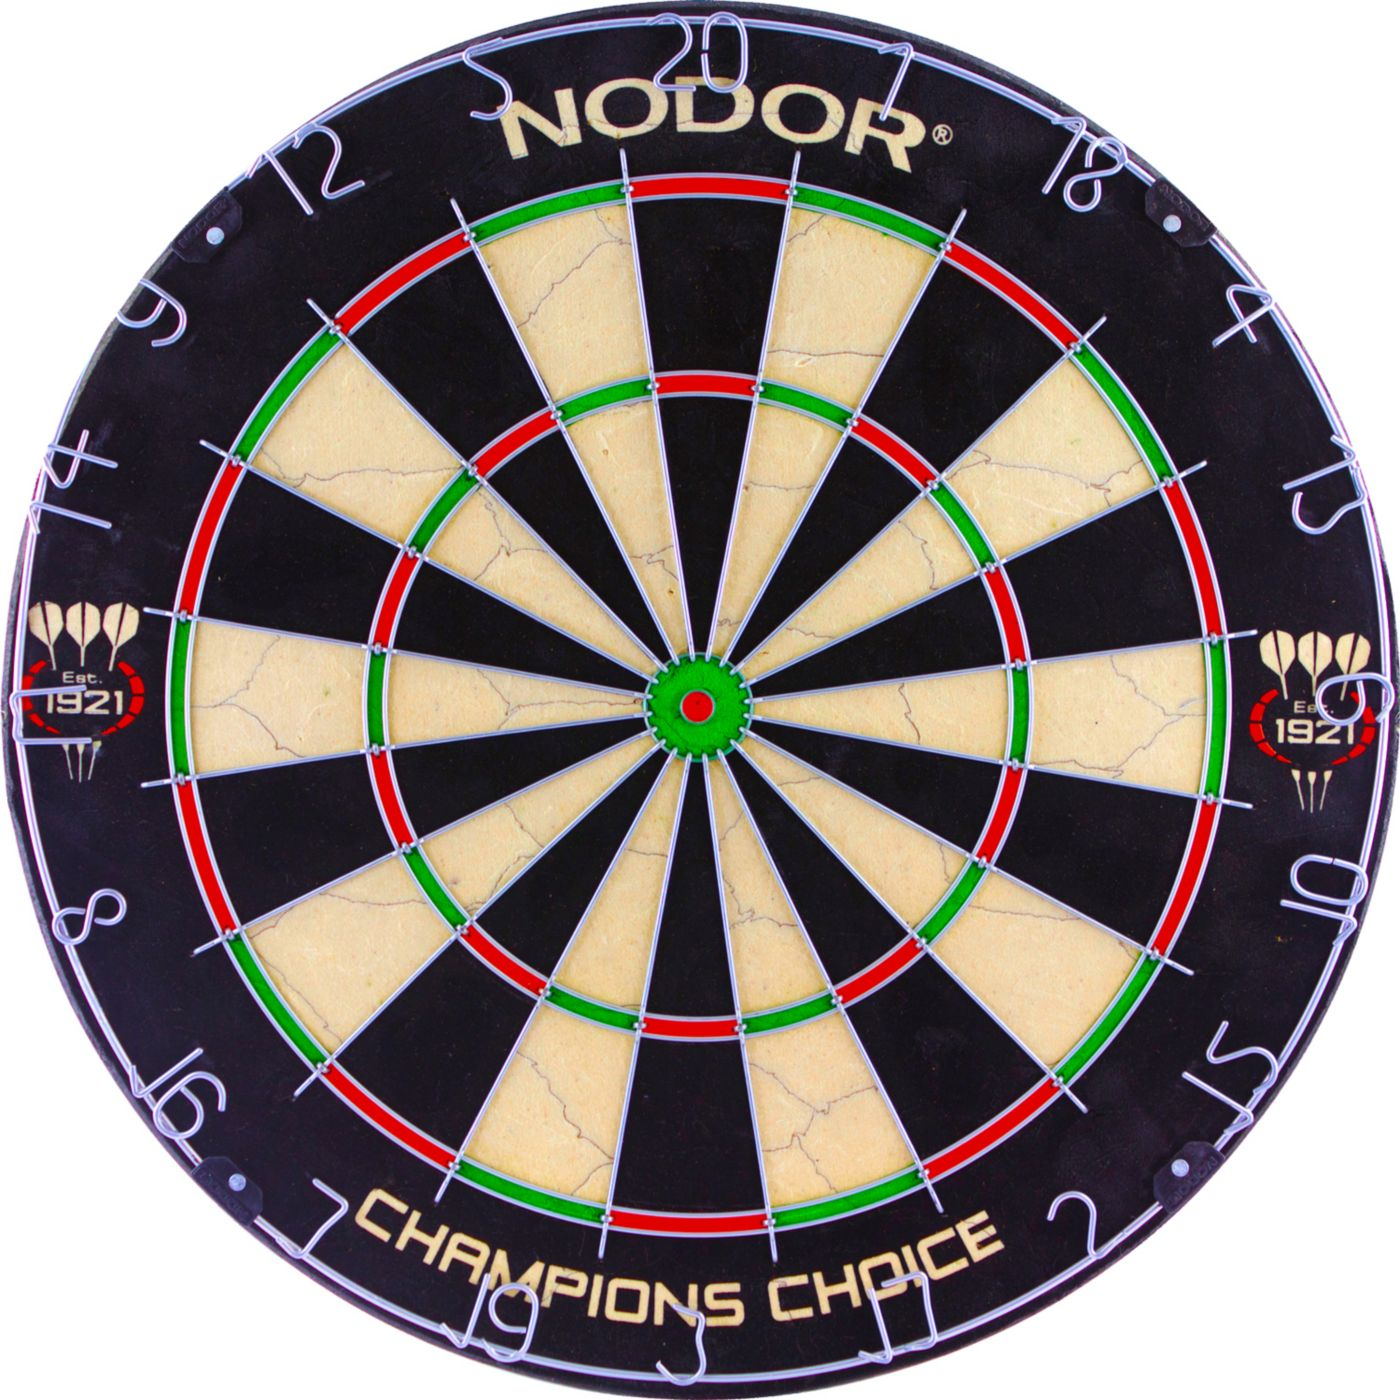 NODOR Champion's Choice Practice Bristle Dartboard